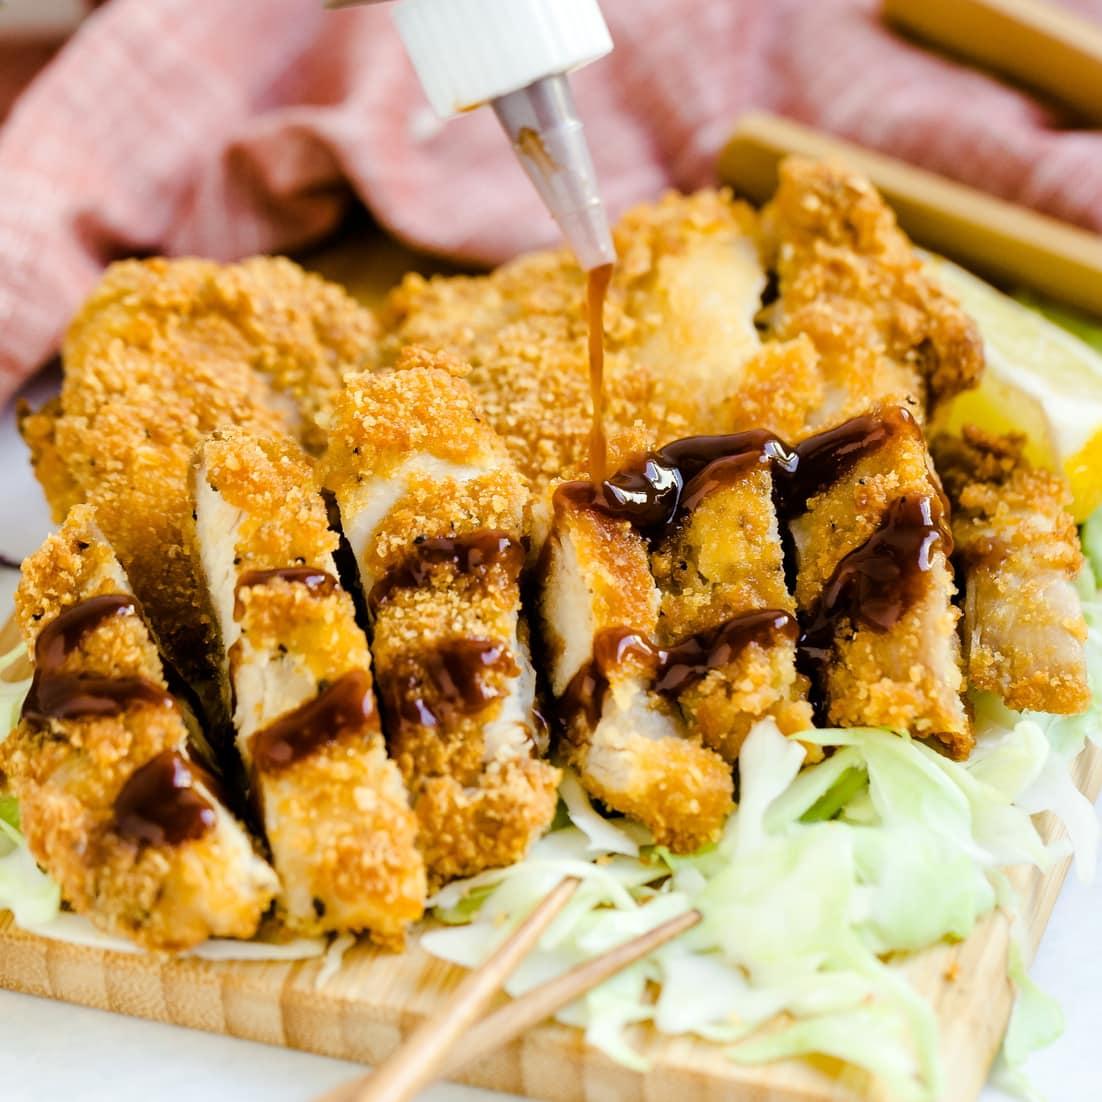 Low carb tonkatsu sauce being squeezed over keto tonkatsu